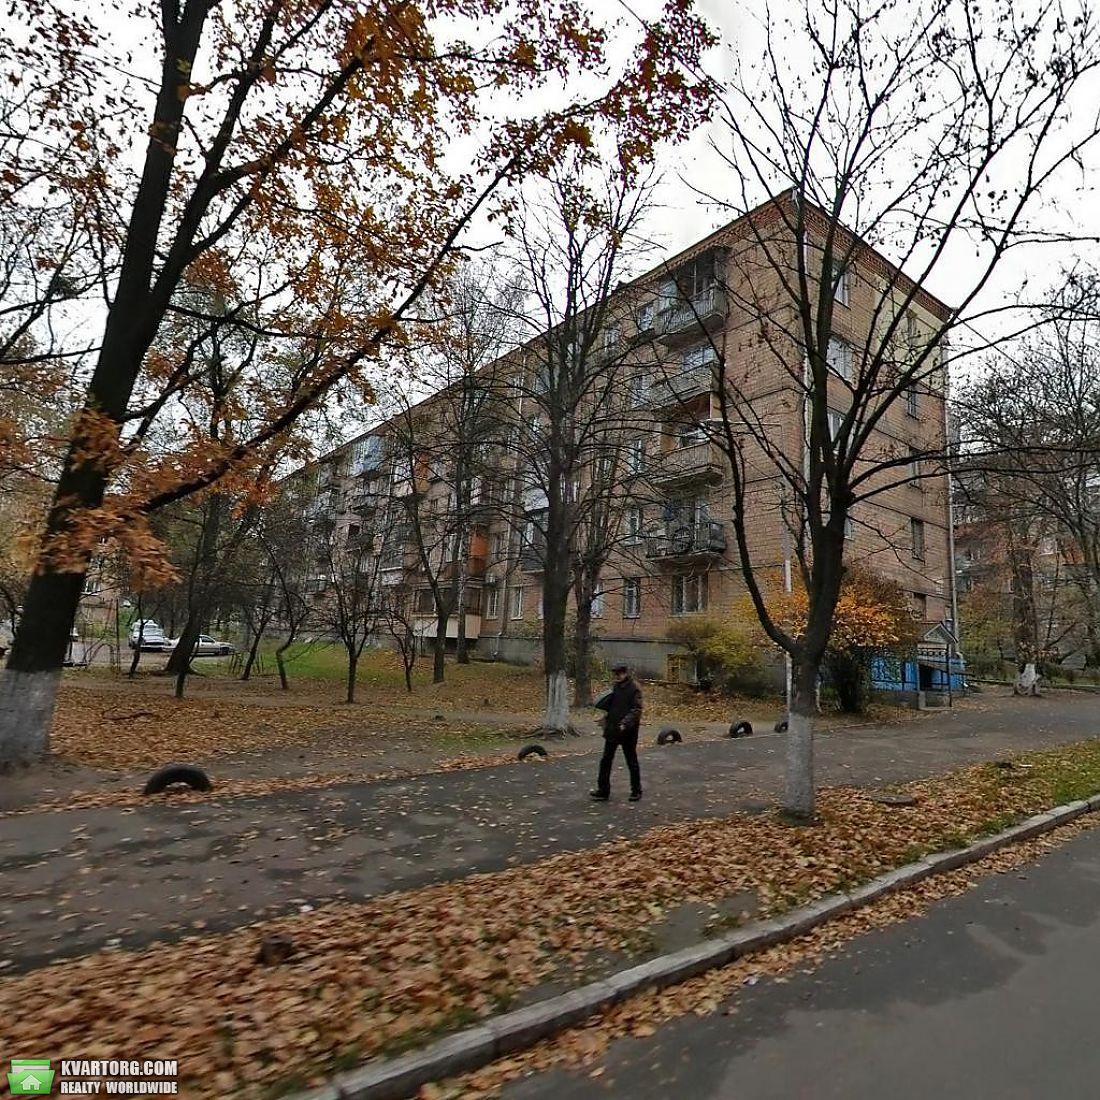 продам 1-комнатную квартиру. Киев, ул. Уманская 25. Цена: 29000$  (ID 1793930) - Фото 2